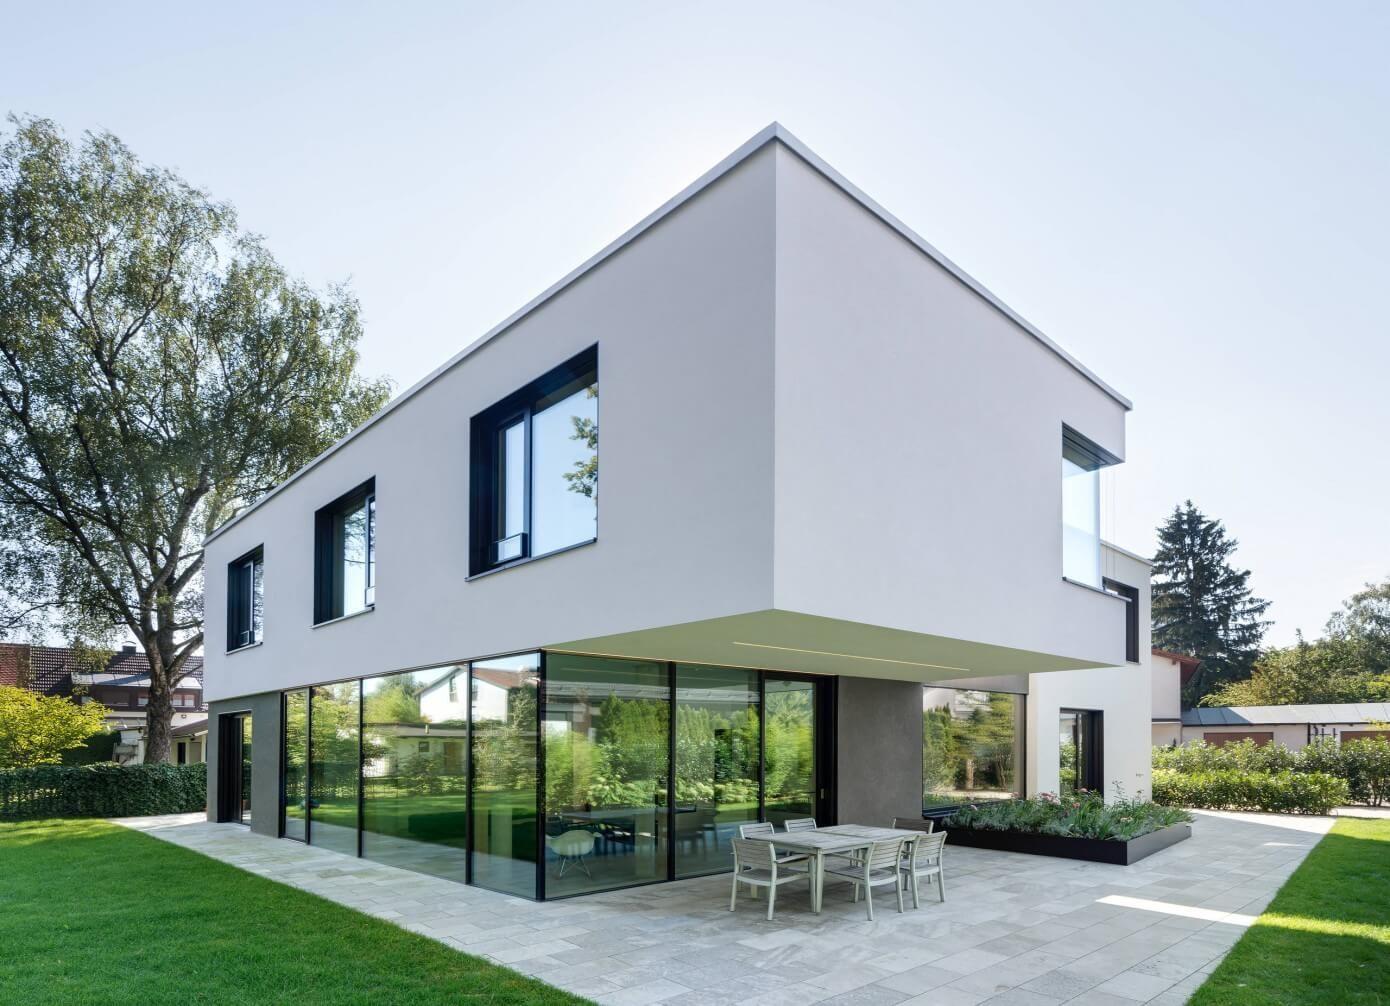 haus w by be planen architektur archi design. Black Bedroom Furniture Sets. Home Design Ideas